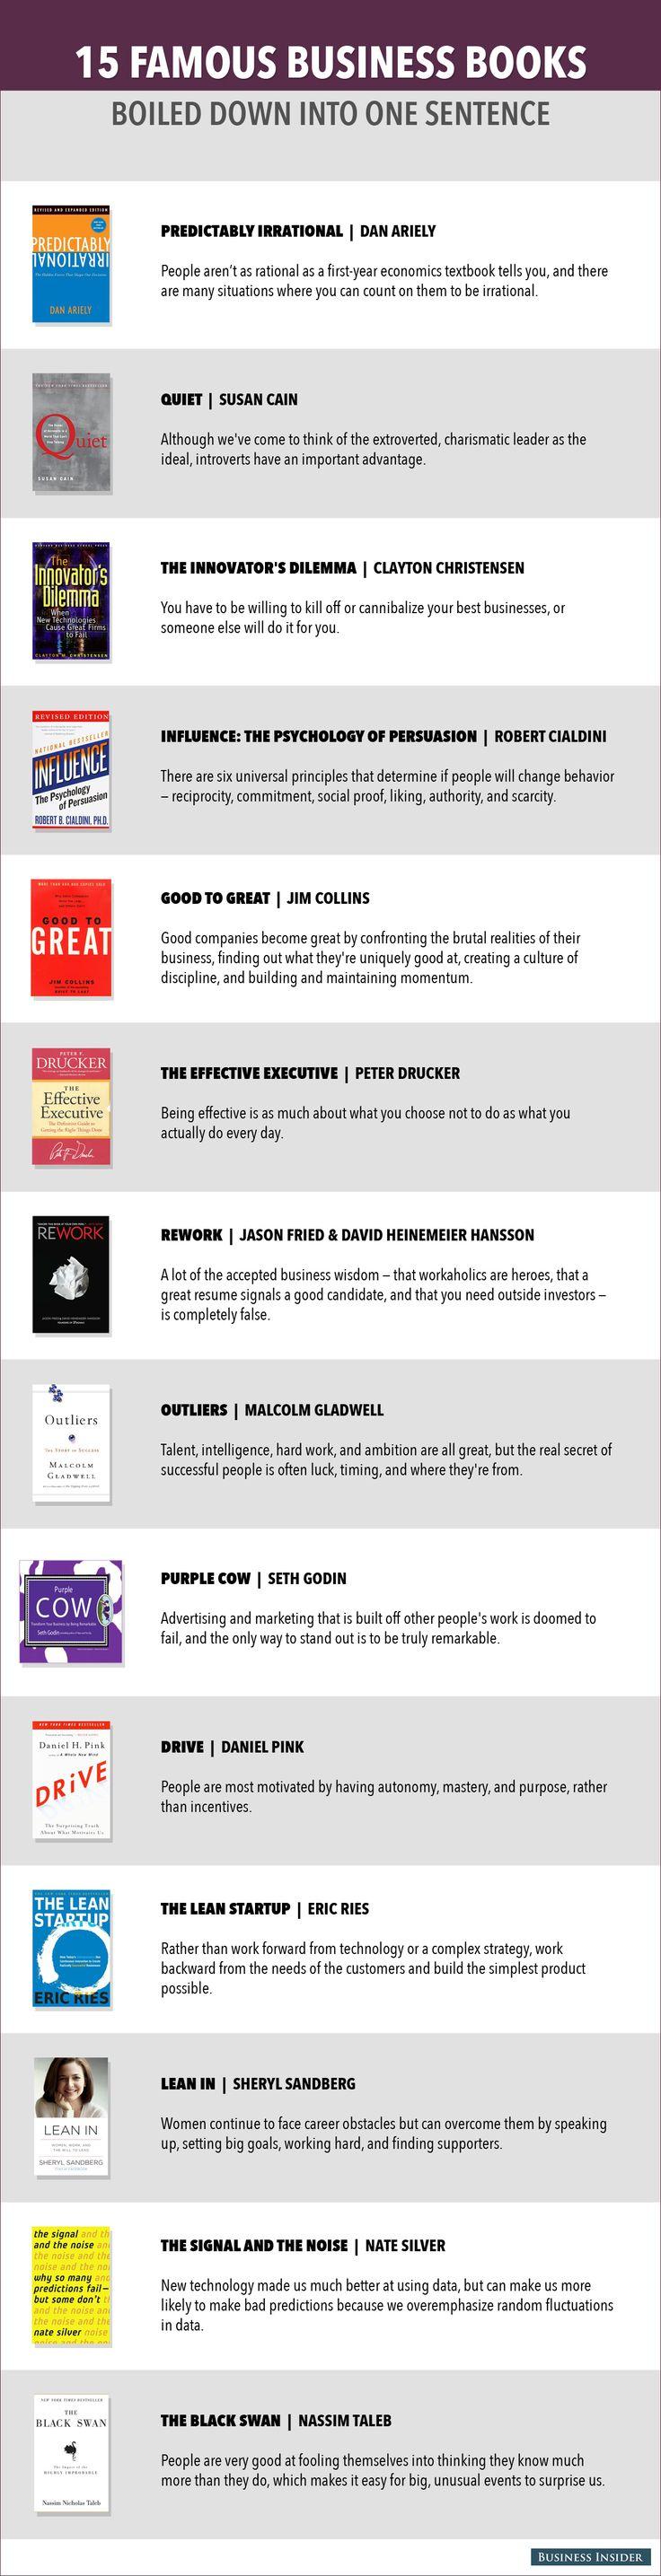 15 Famous Business Books Summarized In One Sentence | Business Insider Australia